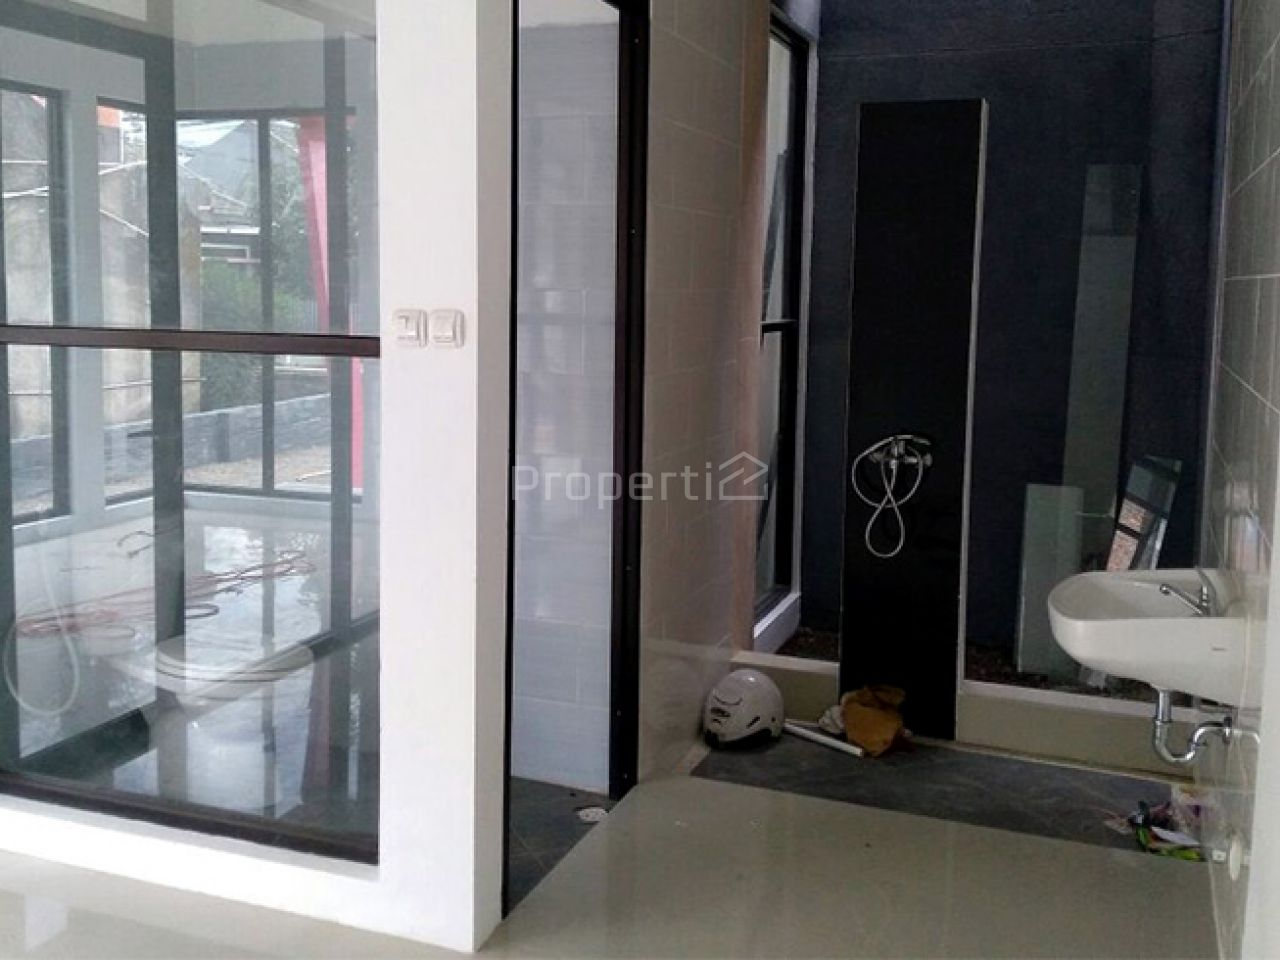 Rumah Baru Cisaranten Unit 2 di Sekitar Arcamanik, Kota Bandung